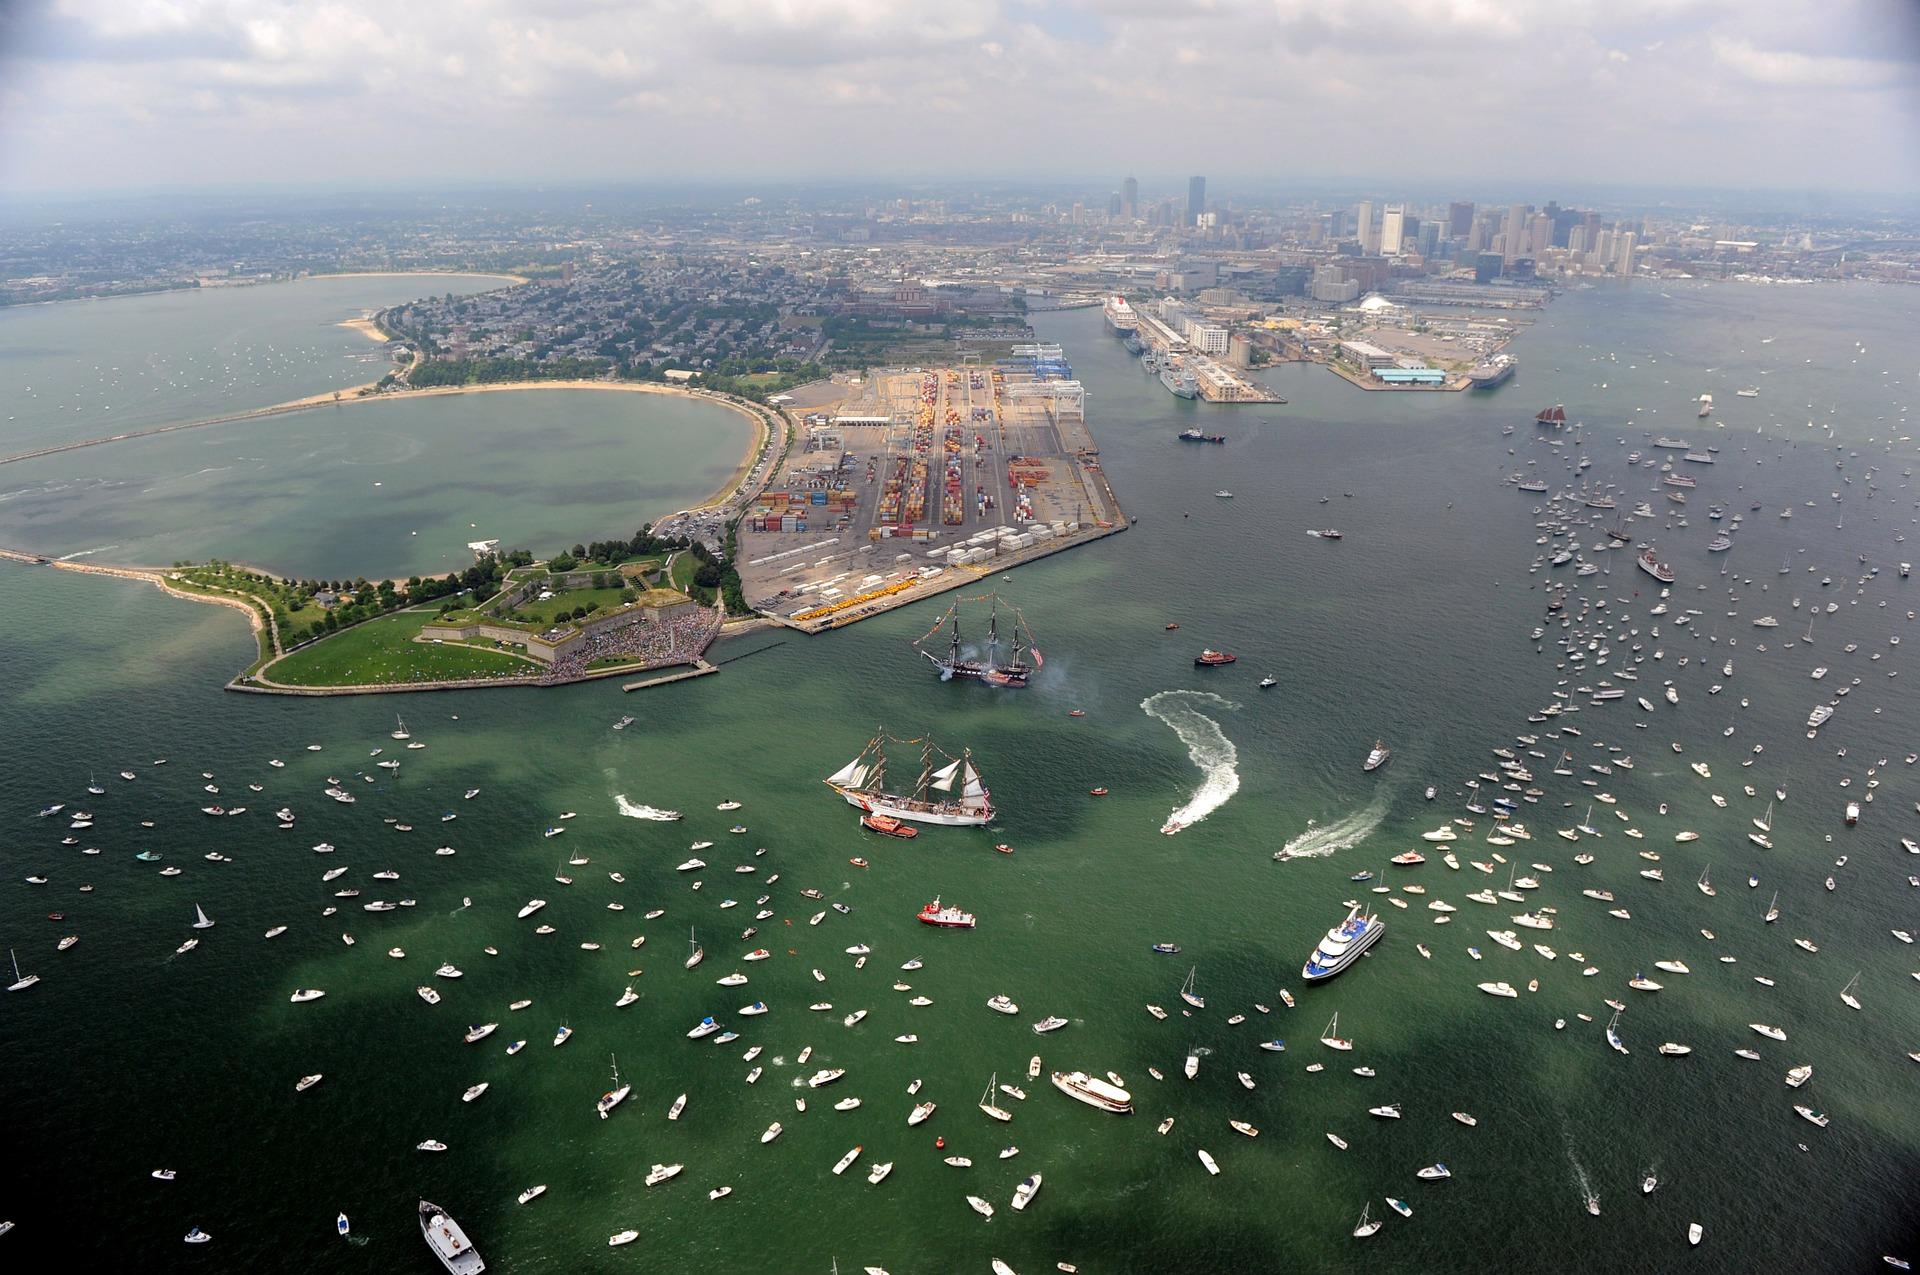 passeio de barco, boston, boston cruise, boston harbor